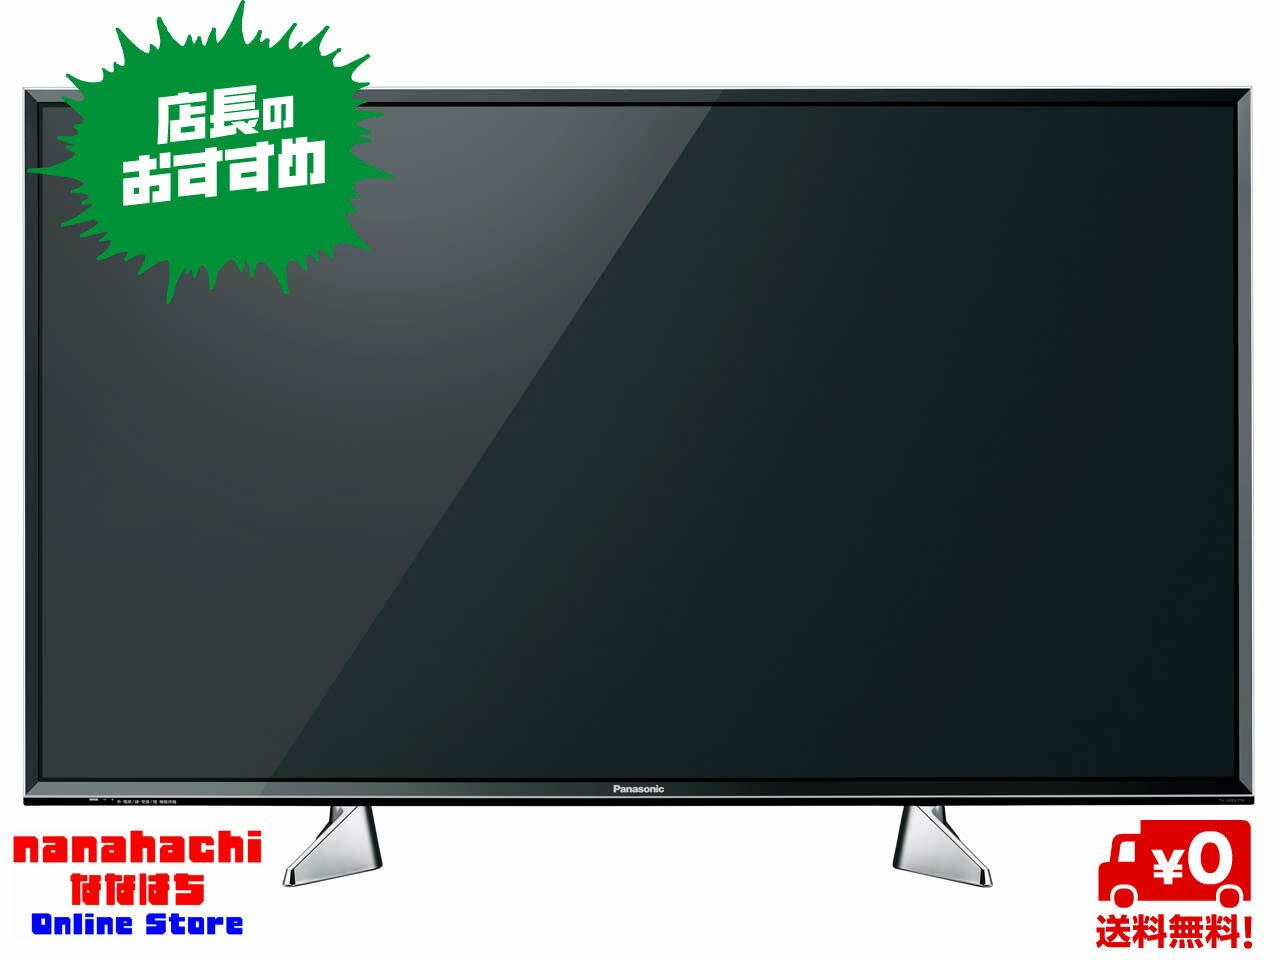 Panasonic VIERA TH-43EX750 [43インチ]4Kビエラ EX750シリーズ 4K HDR & 各種VOD対応4Kビエラ スタンダードモデル【送料無料・一部地域を除く】